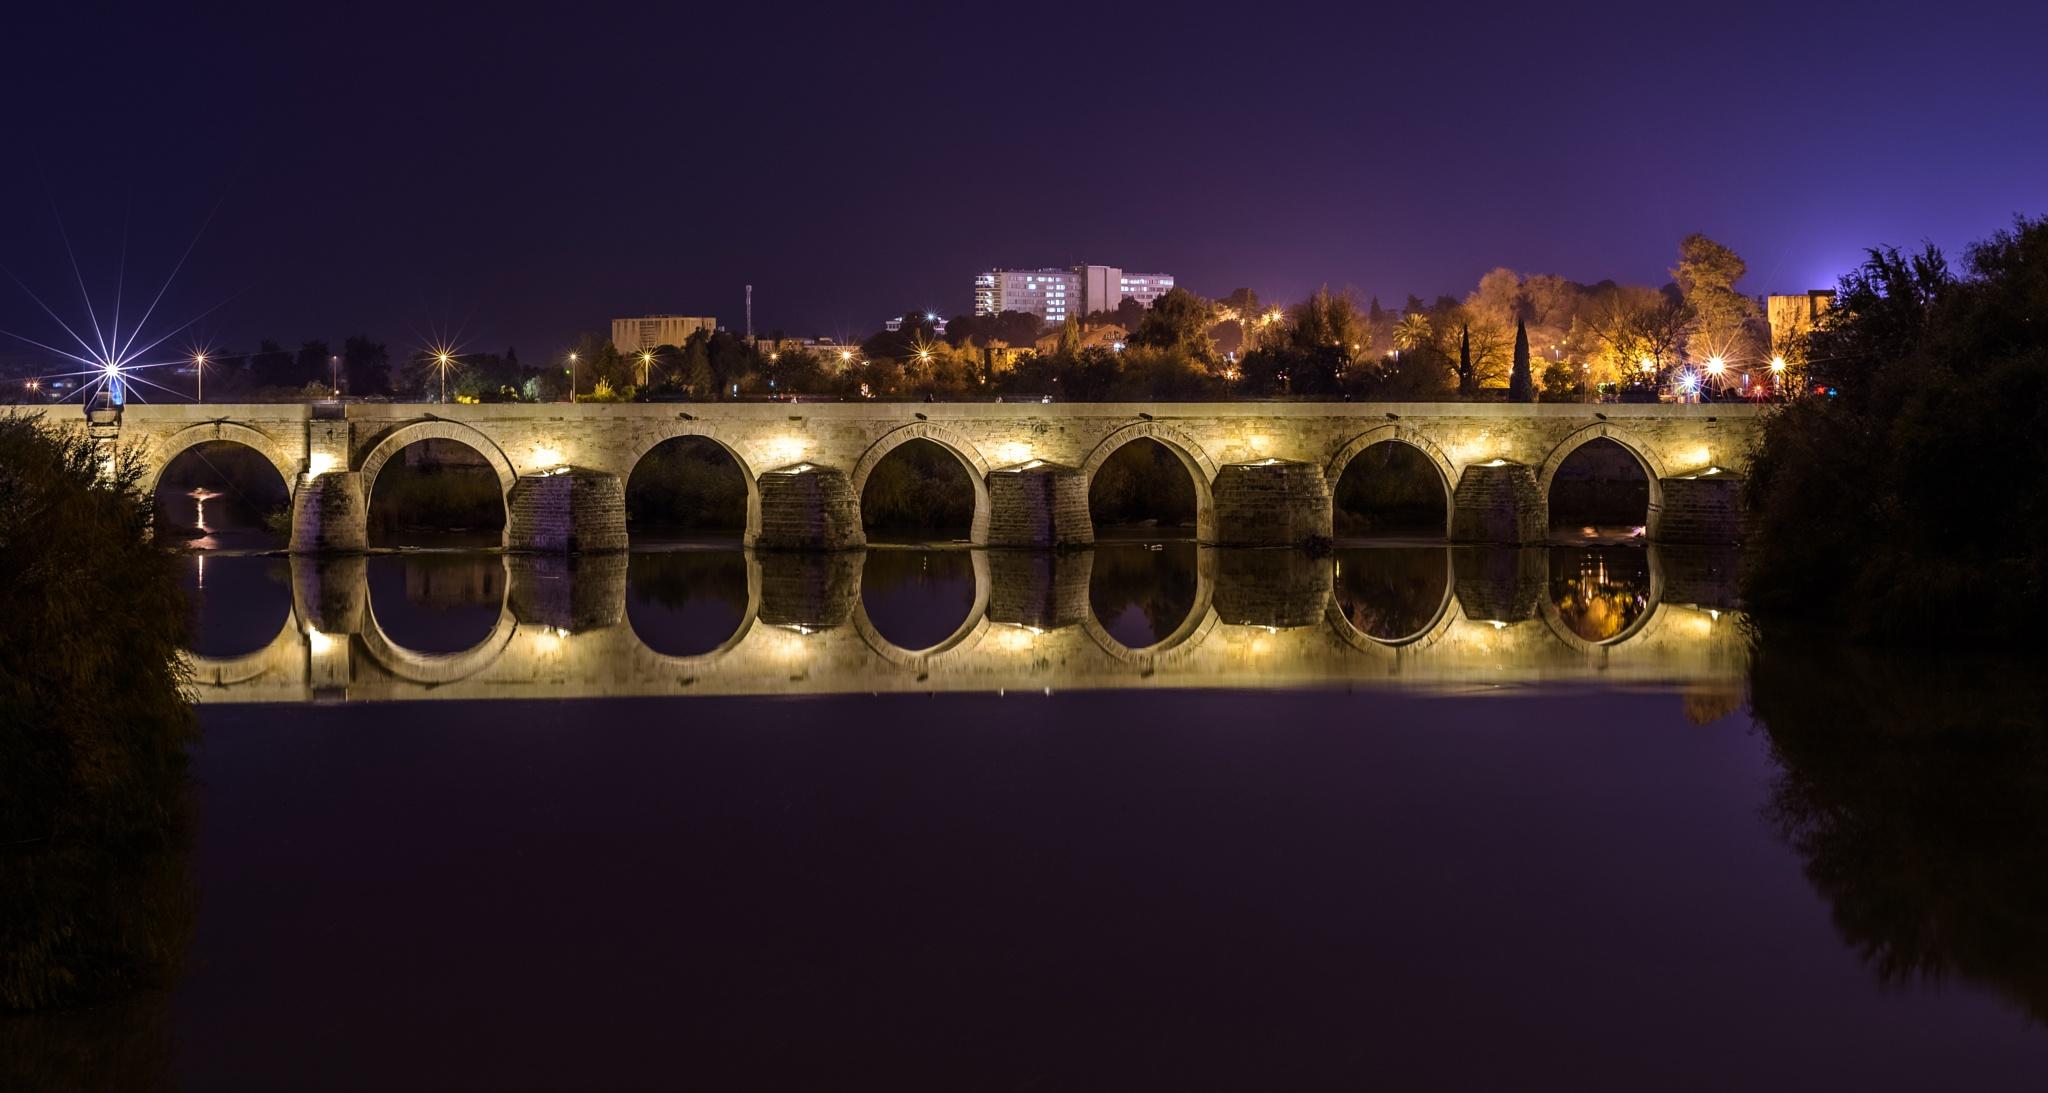 Bridge in Spain by Simo Tynys